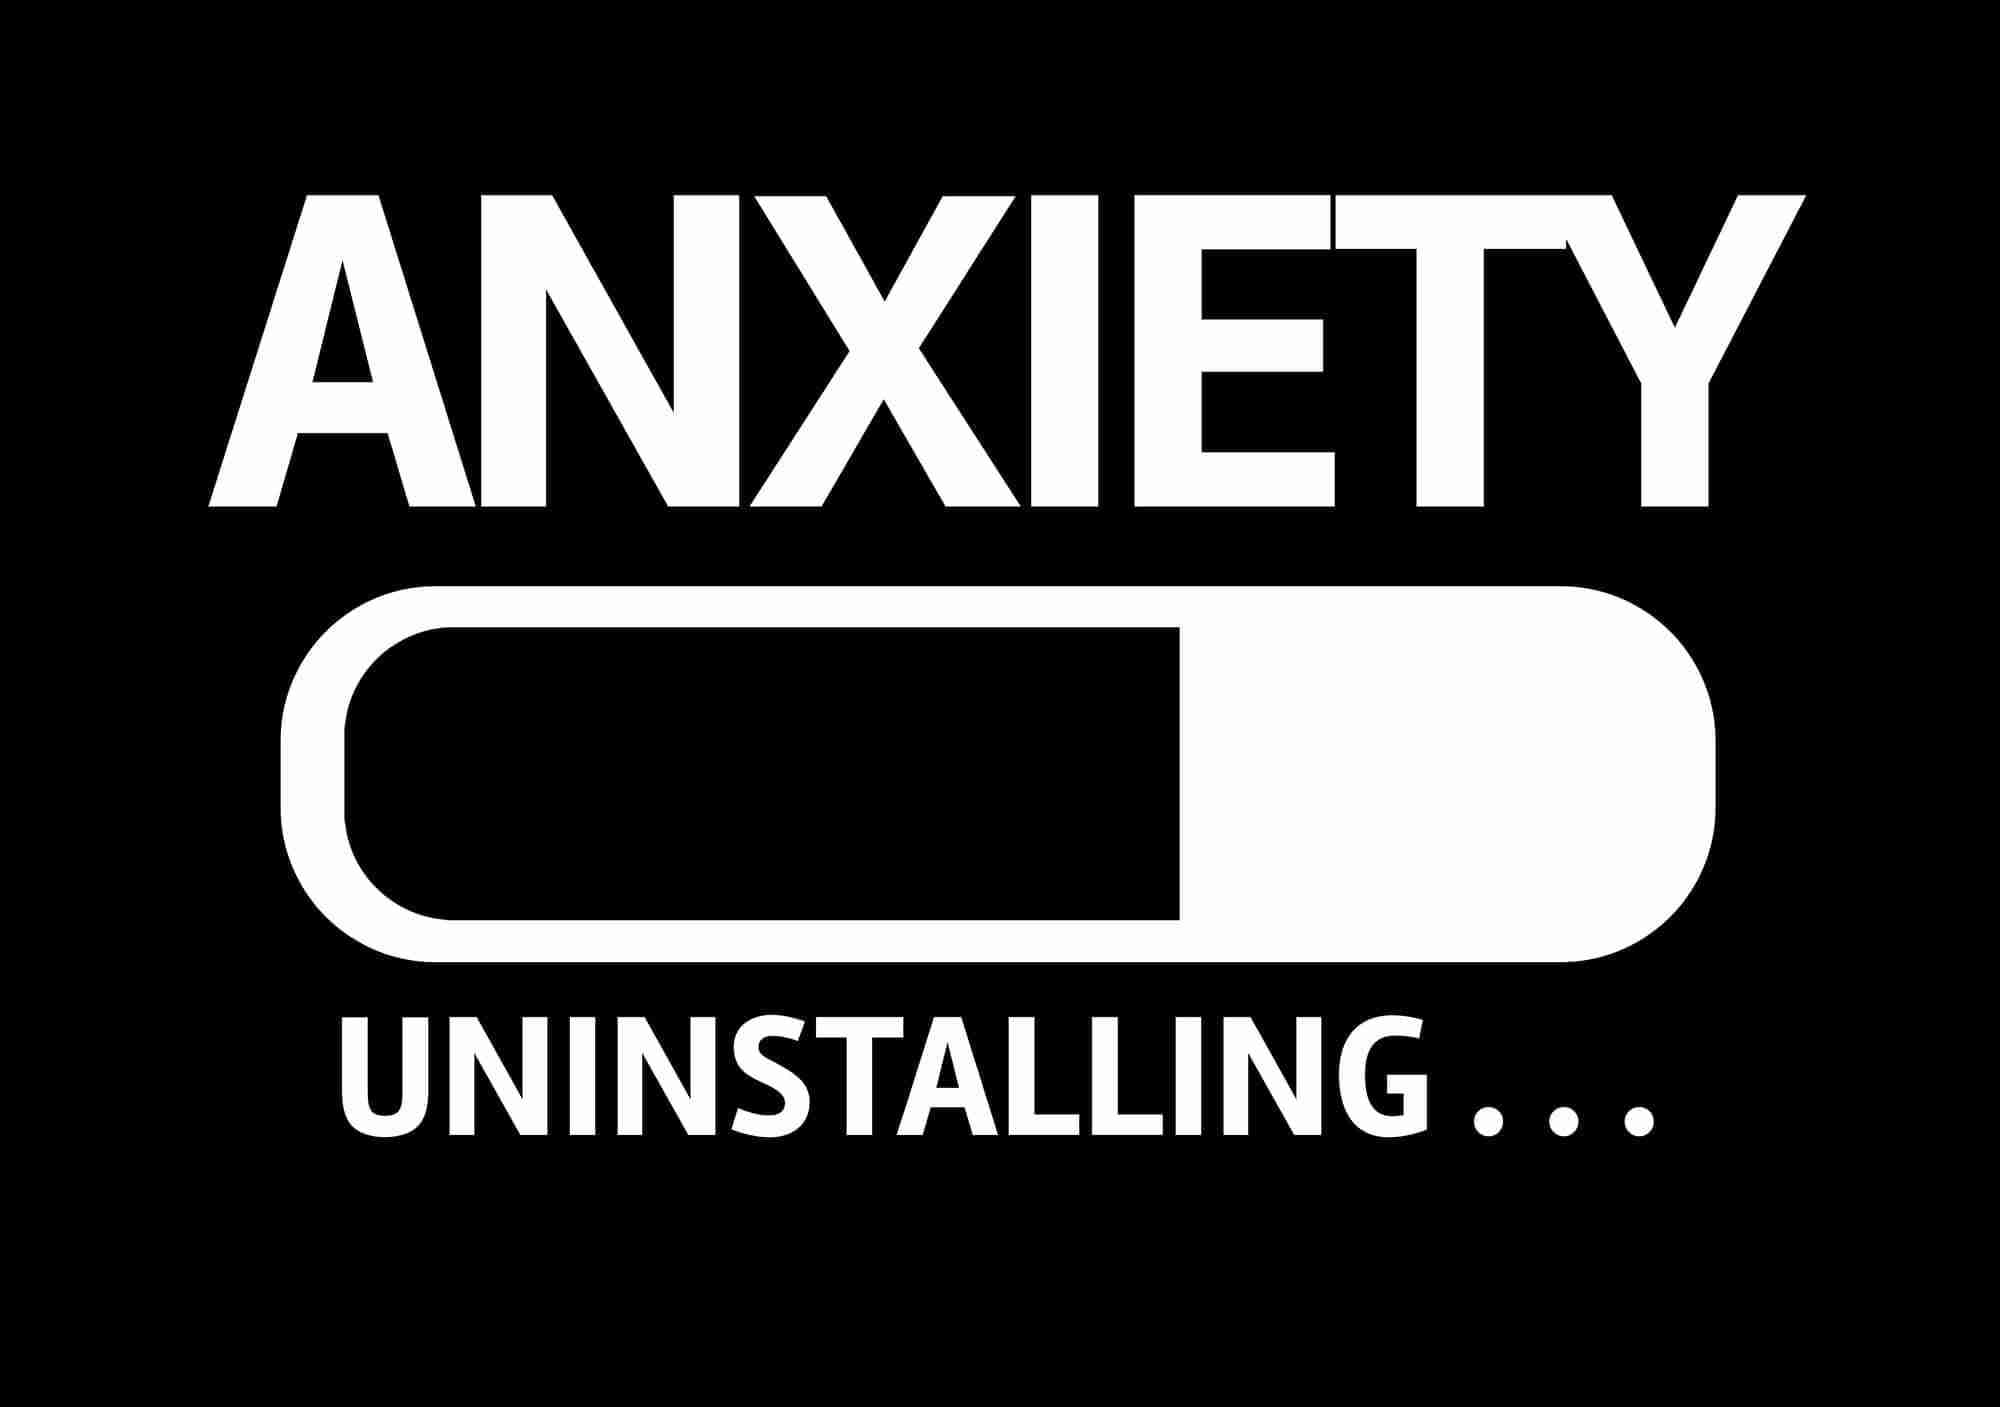 anxiety uninstalling